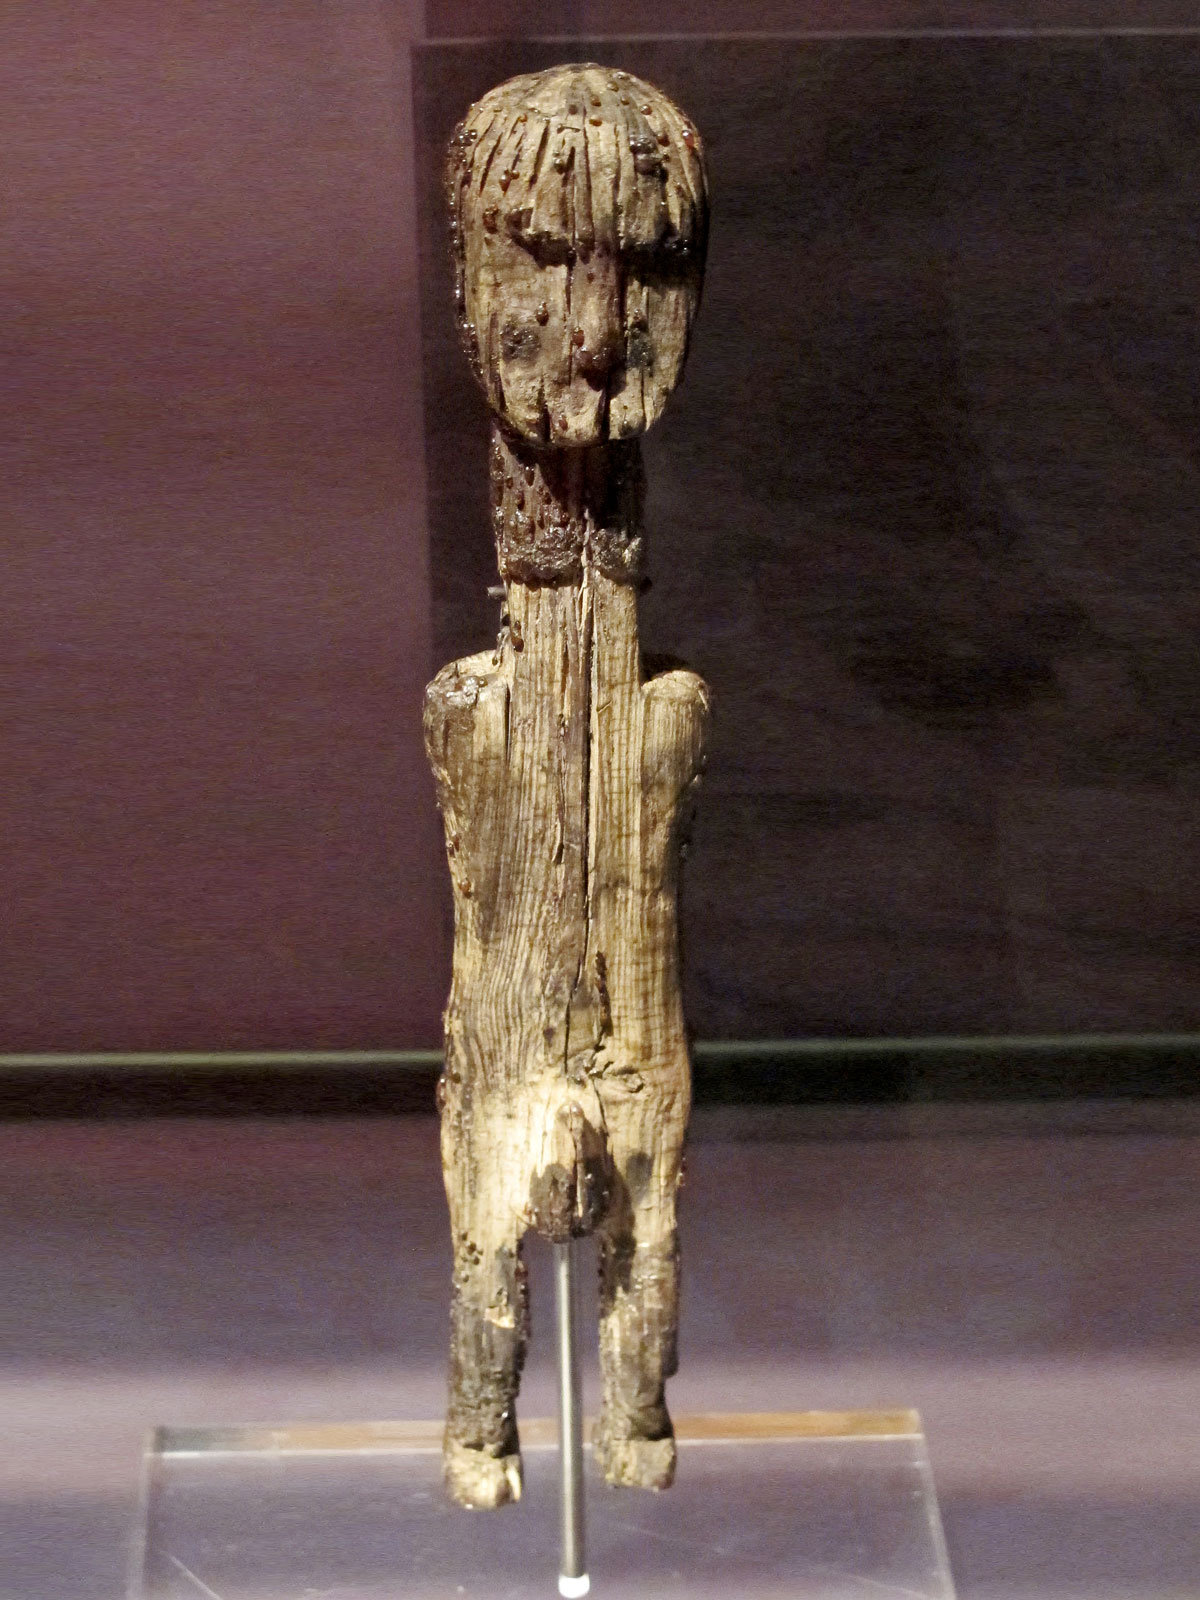 The Kingsteignton Figure c350-426 BC